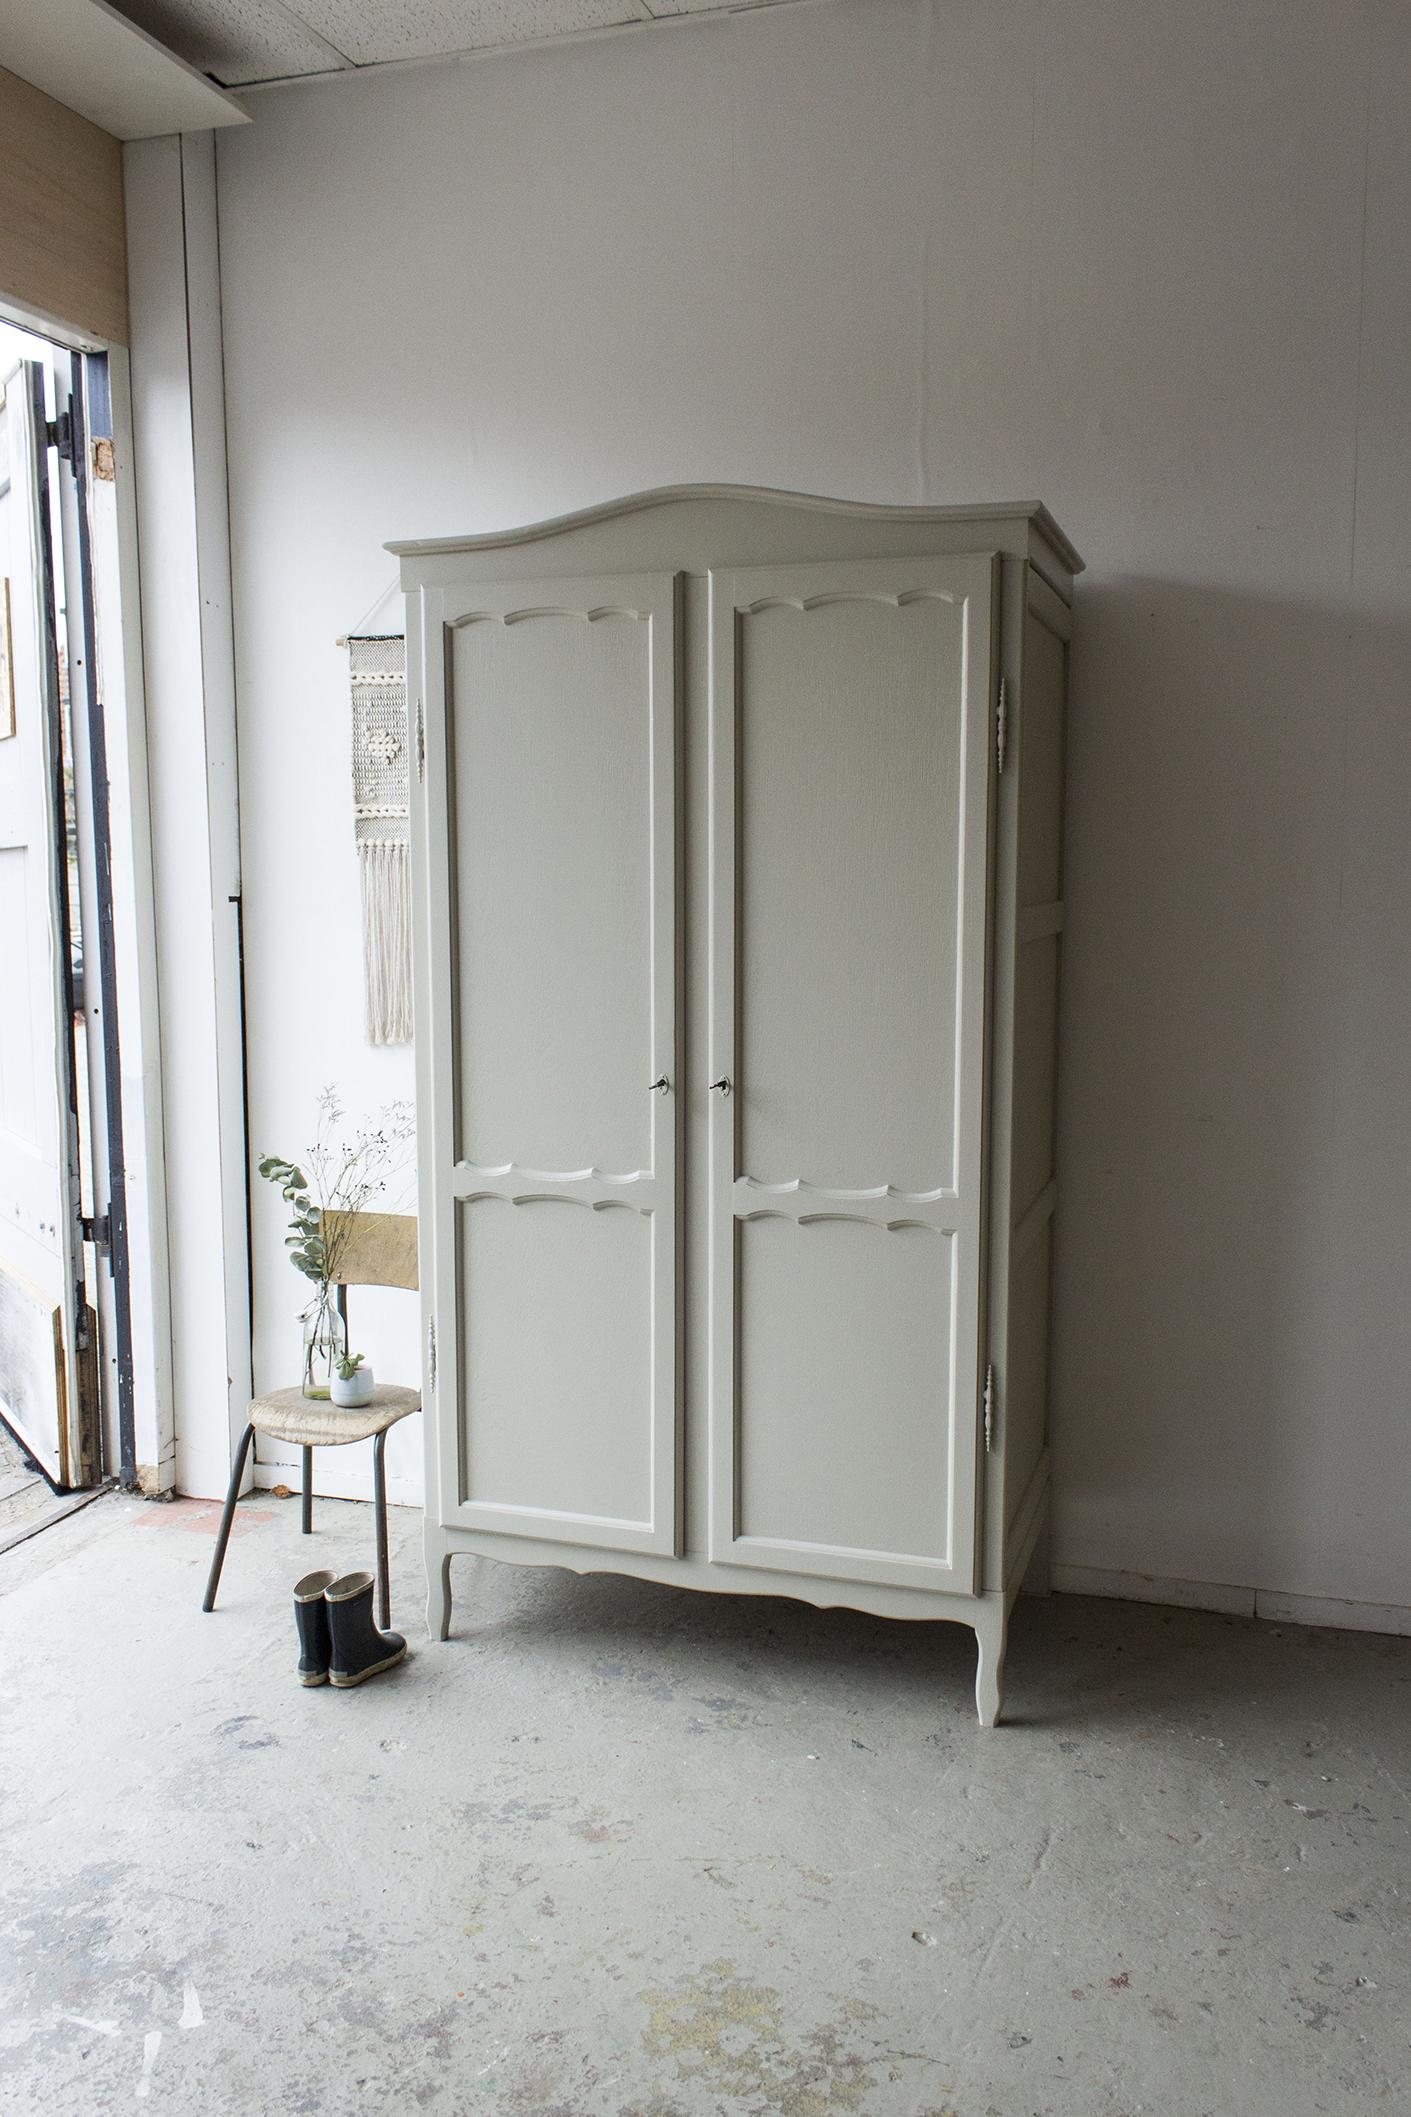 1406- demontabele sierlijke vintage kast in Linnen kleur - Firma zoethout_2.jpg